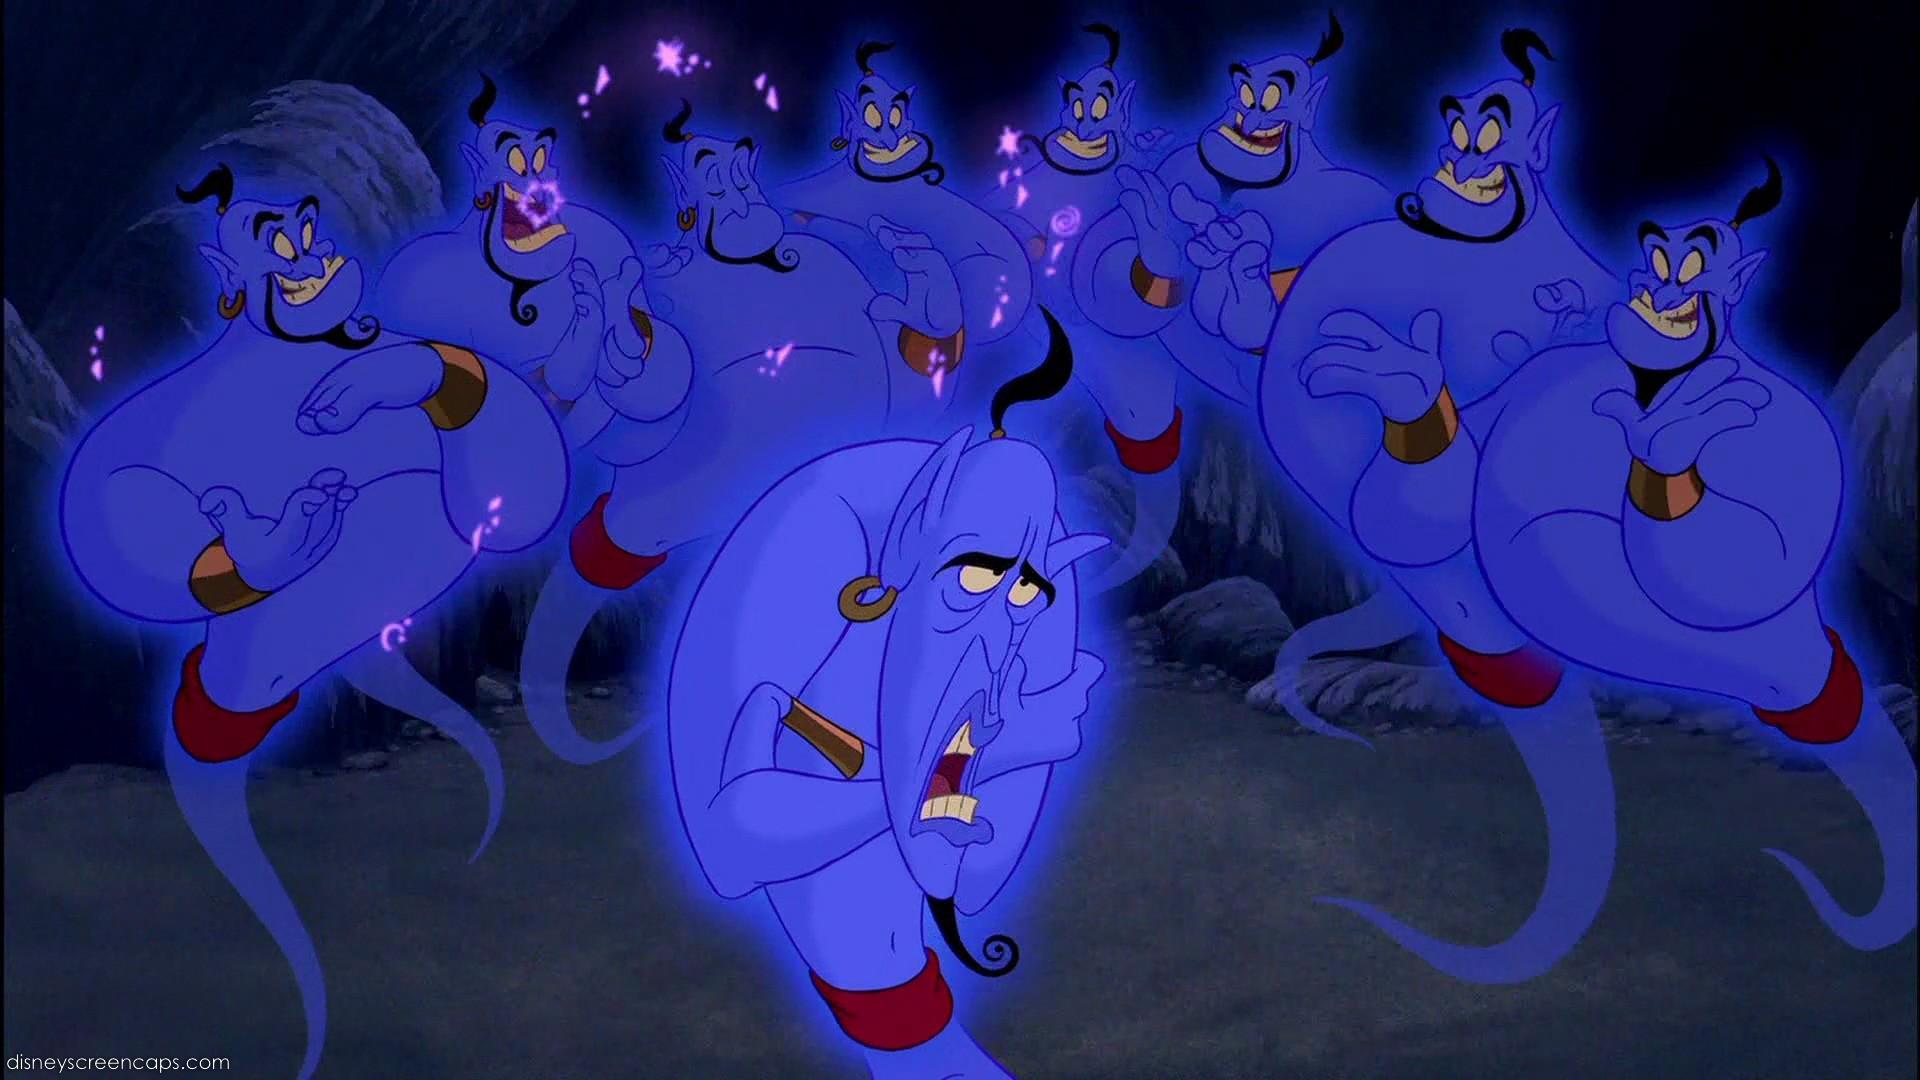 Image Aladdin Disneyscreencaps Com 4215 Jpg Disneywiki